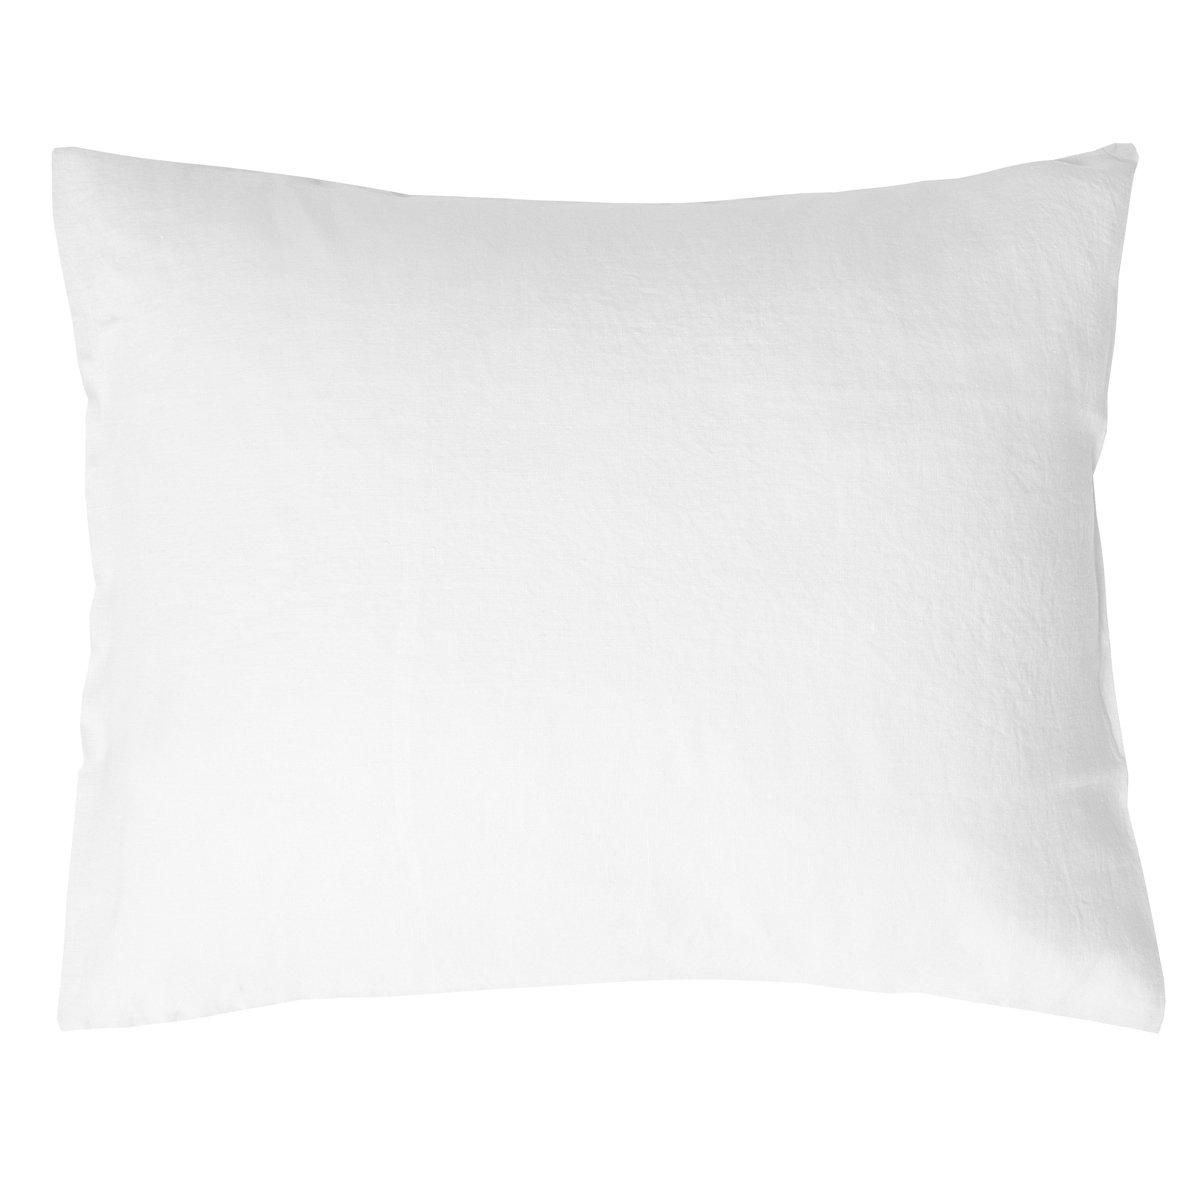 Matri Linnea Pillowcase, Milk